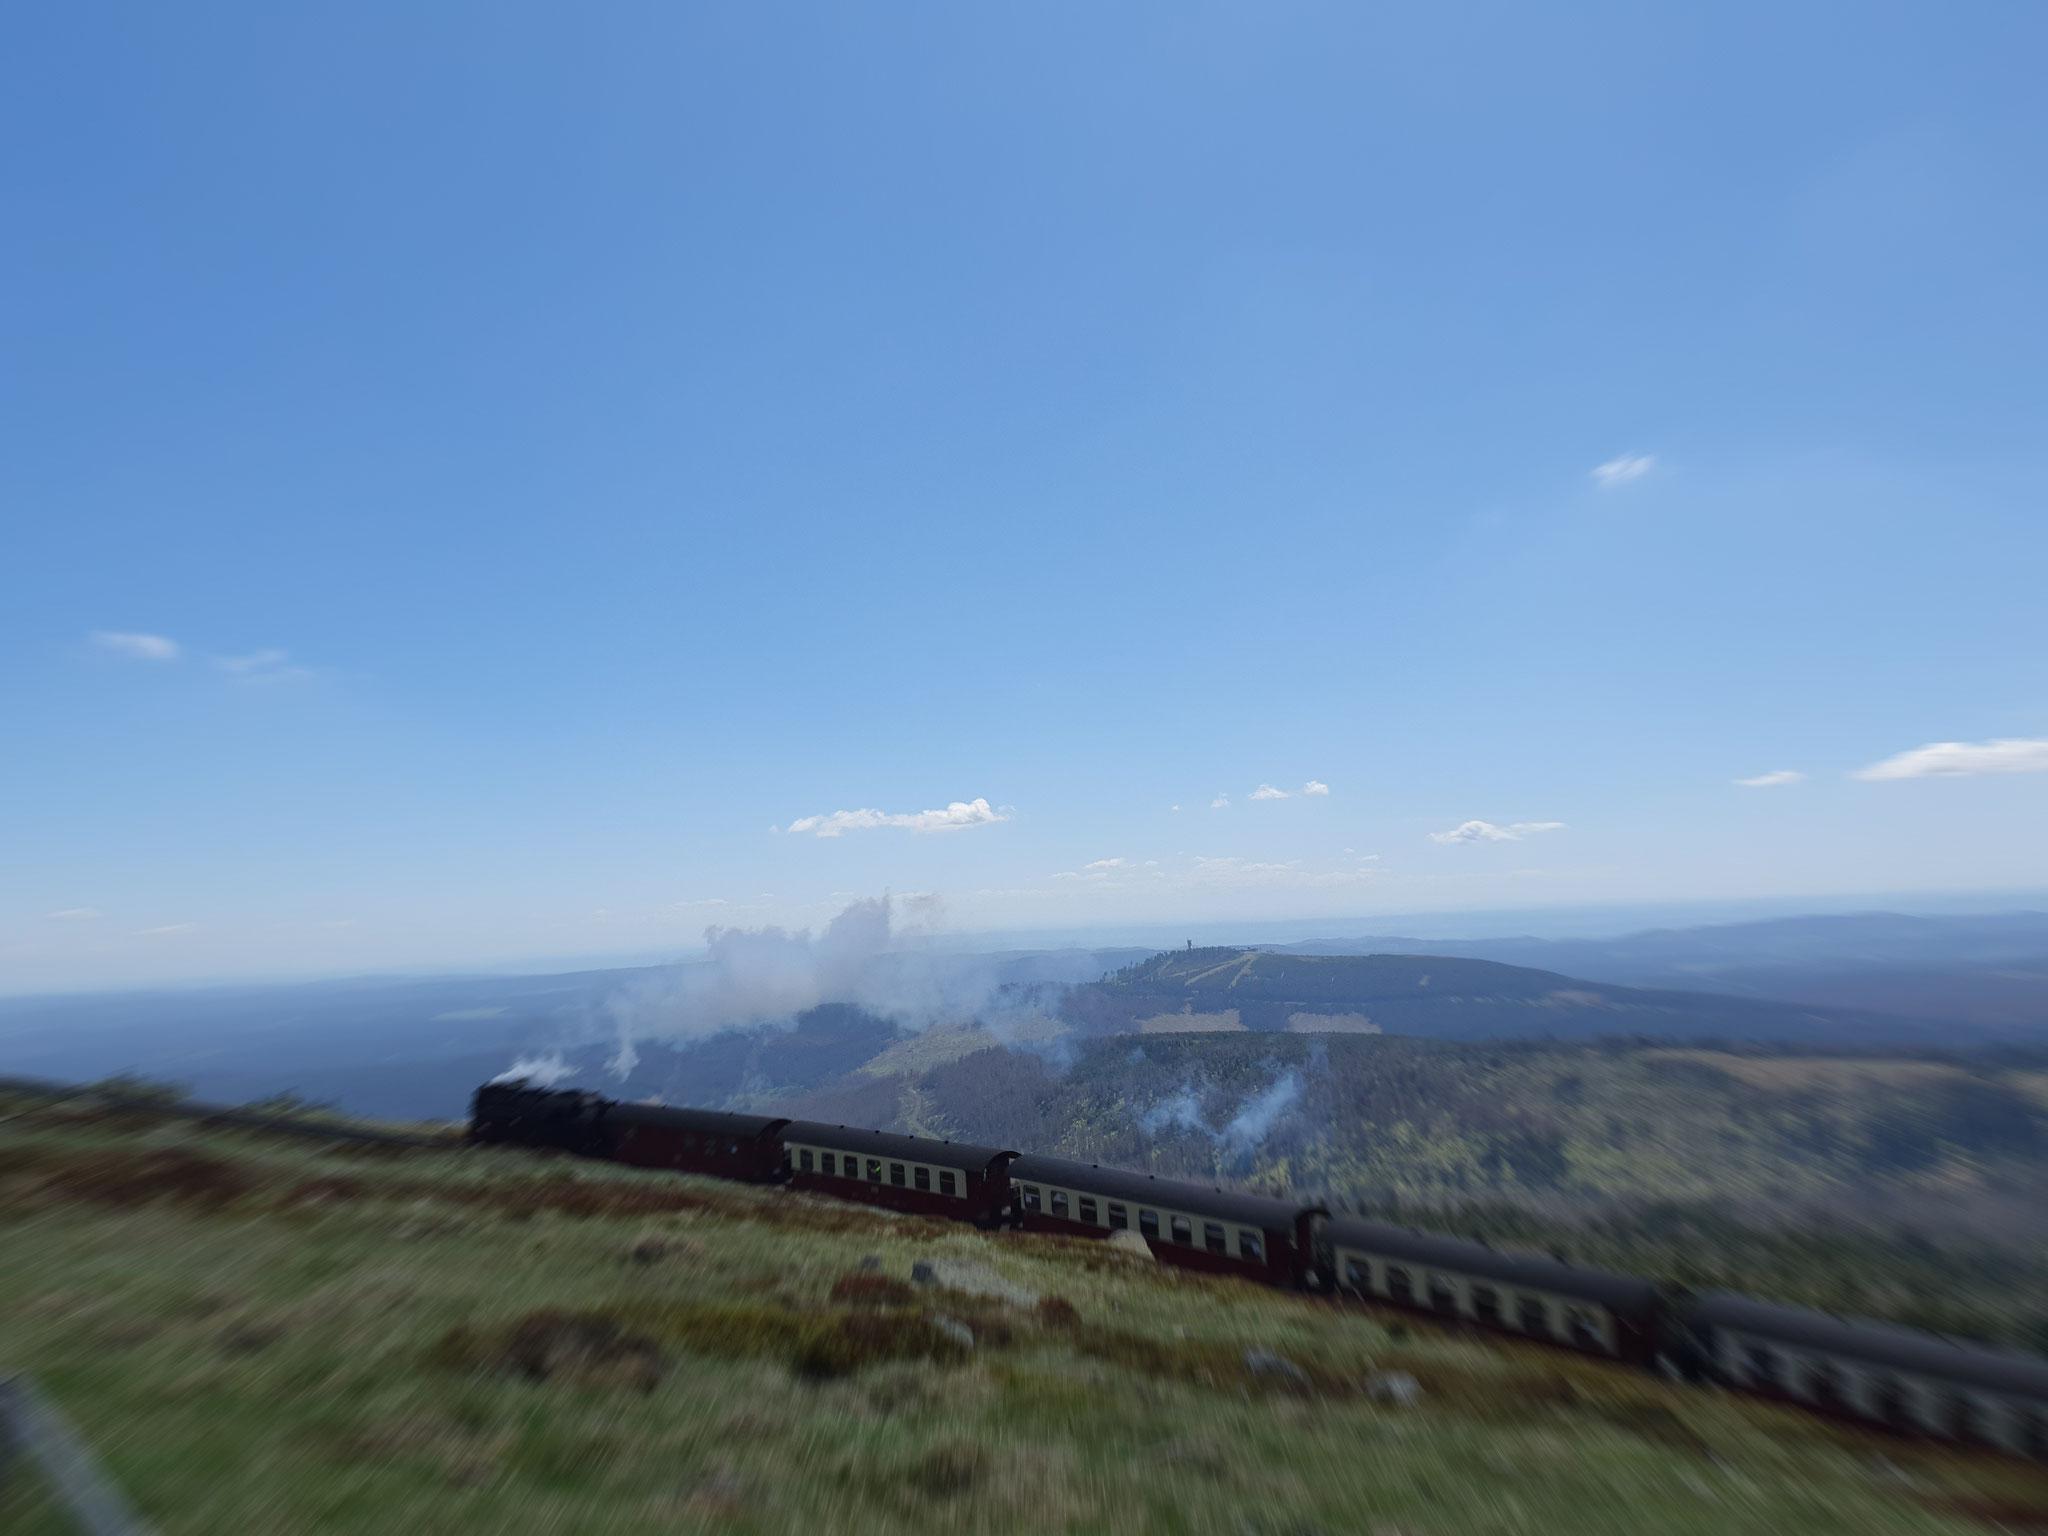 Schalspurbahn zum Brocken